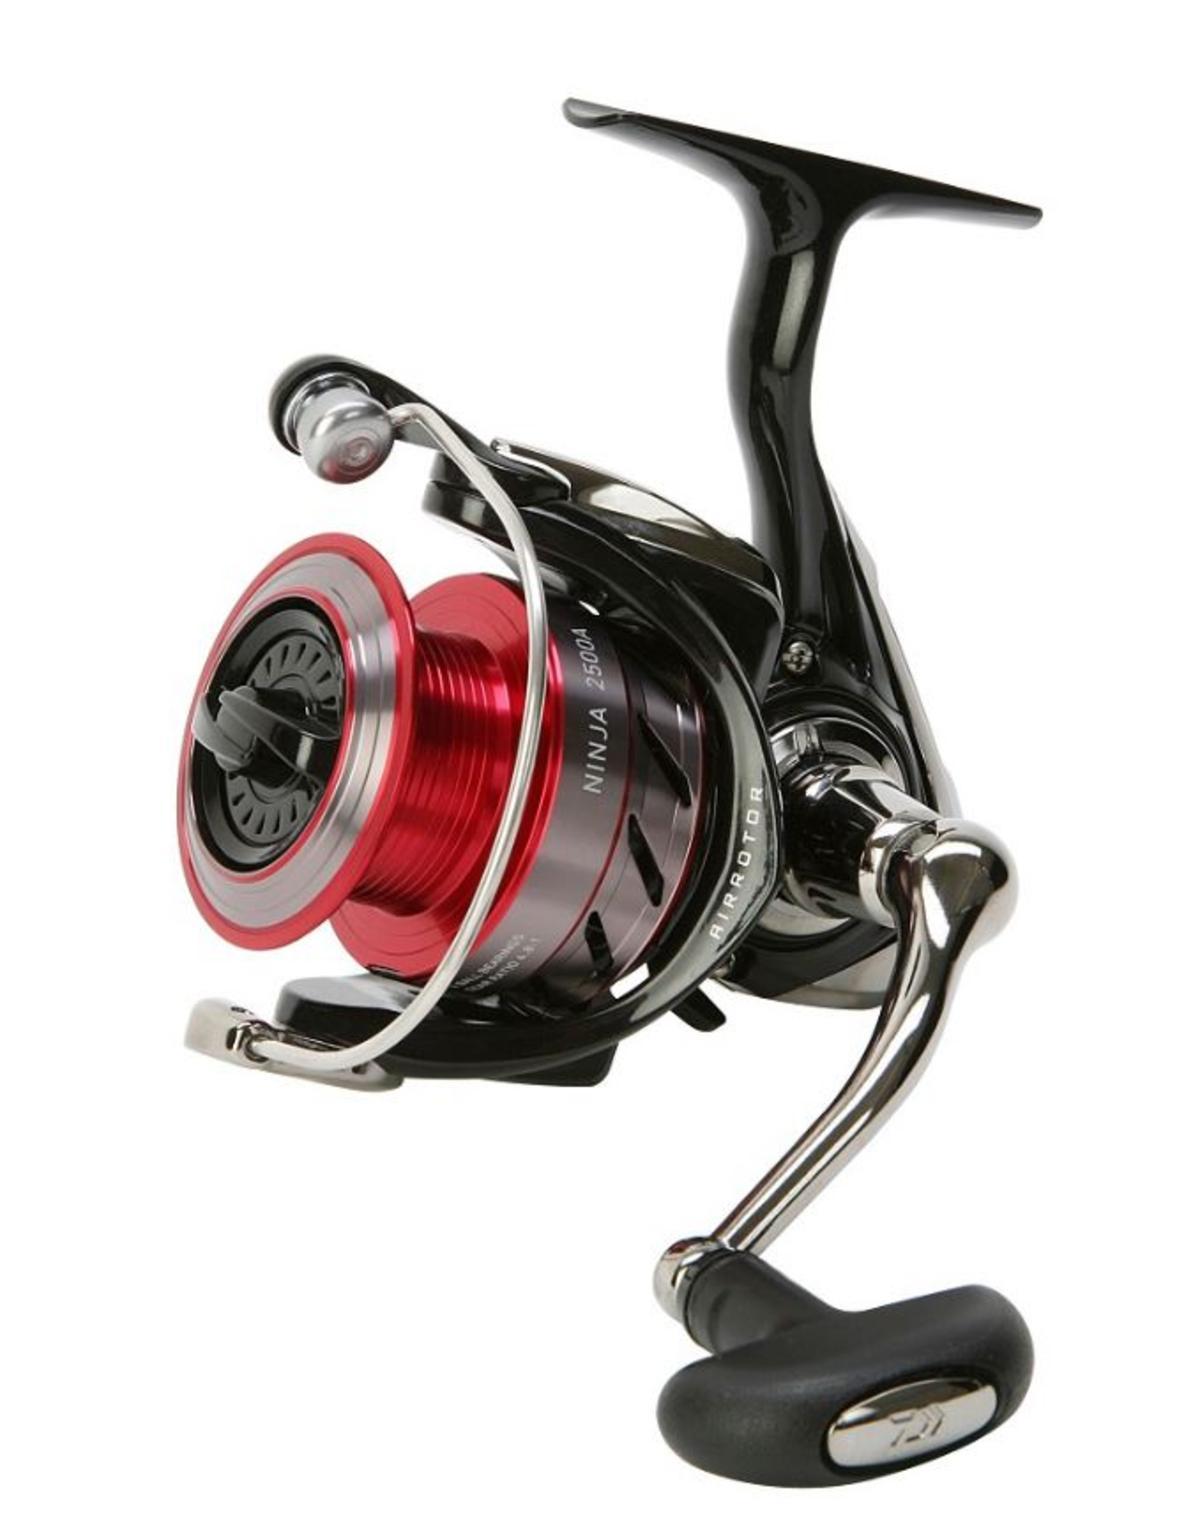 Ex Display Daiwa Ninja match & feeder 3012DA Spinning Fishing Reel